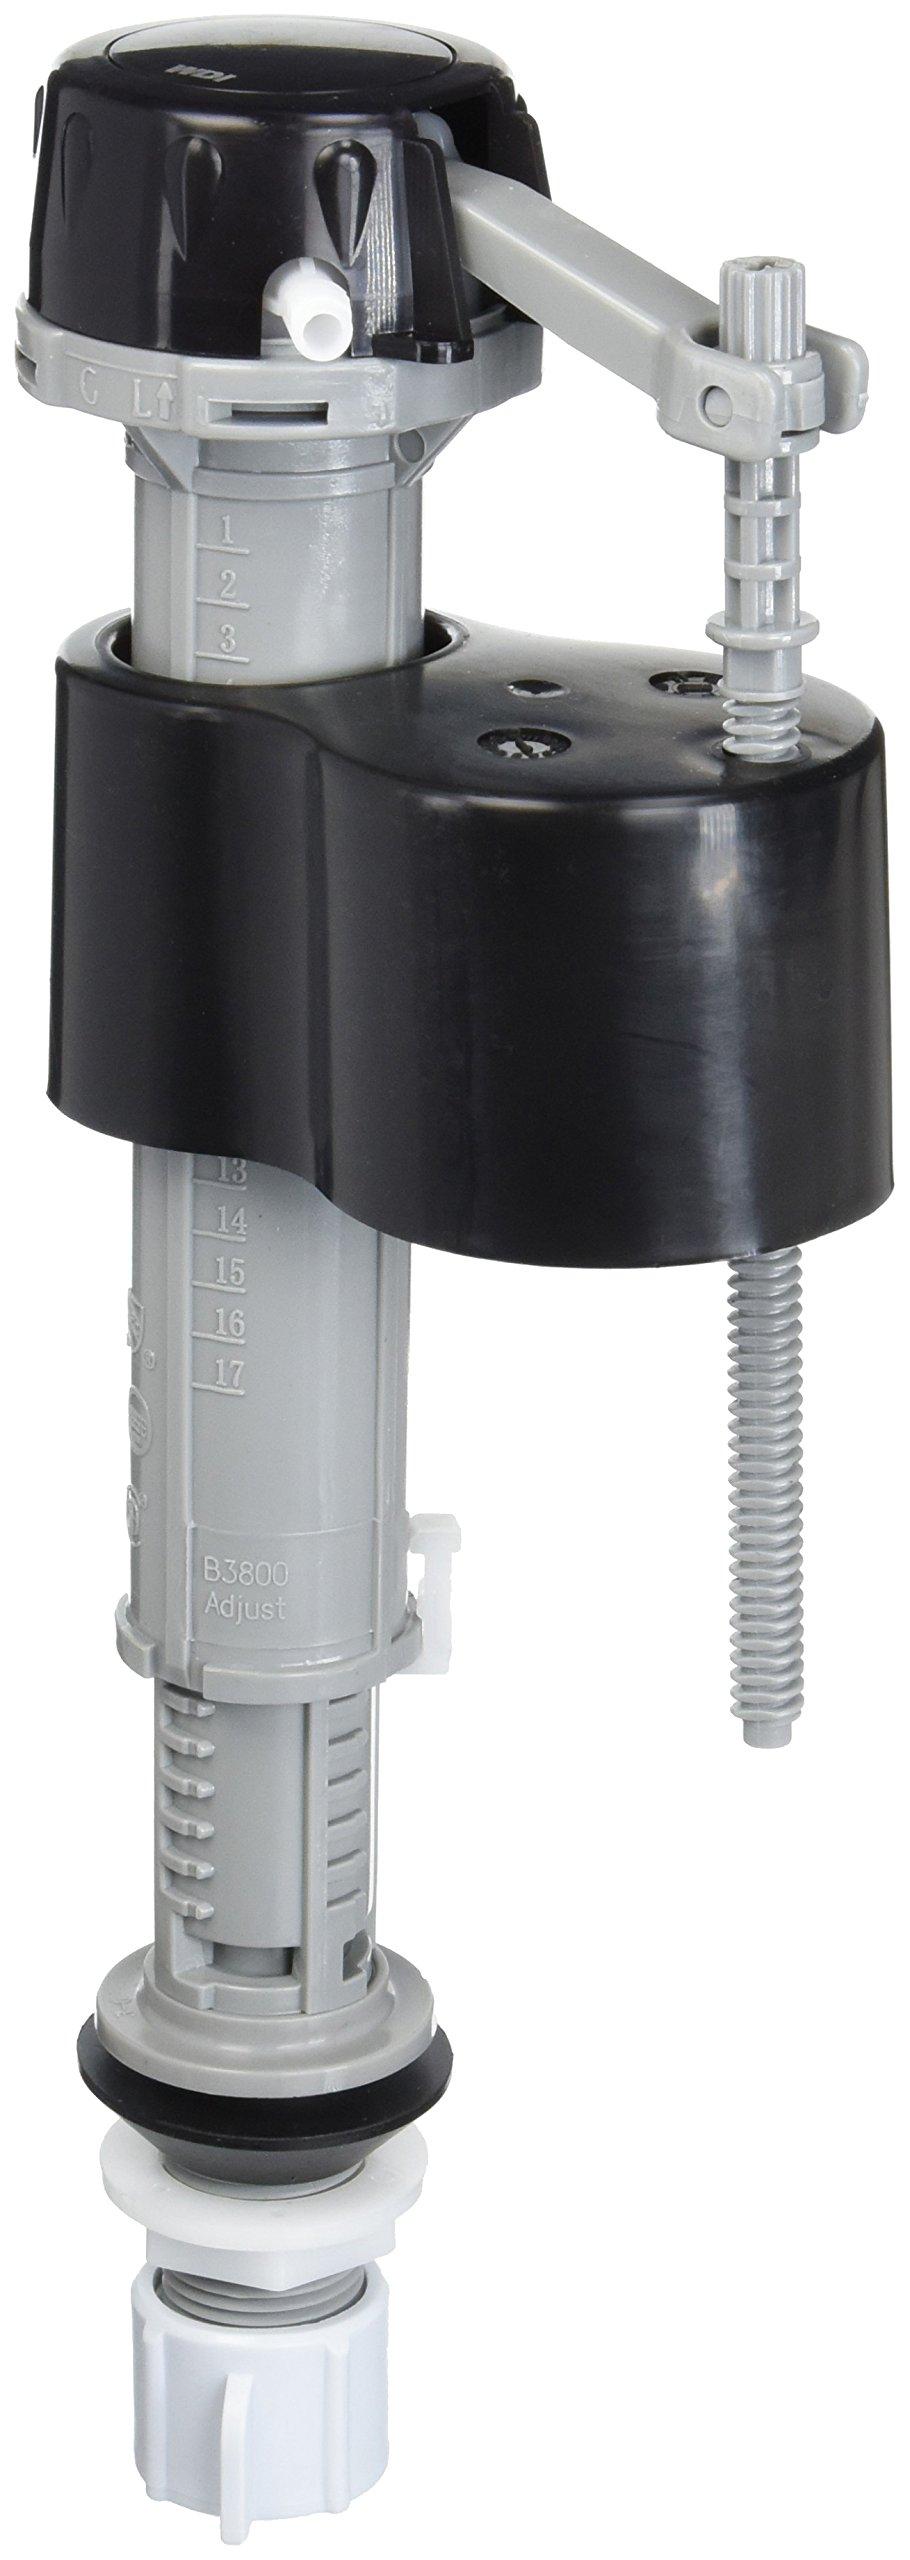 Plumbcraft Eco-friendly Adjustable Perfect Flush Anti-siphon Toilet Fill Valve - Fits Most Toilets